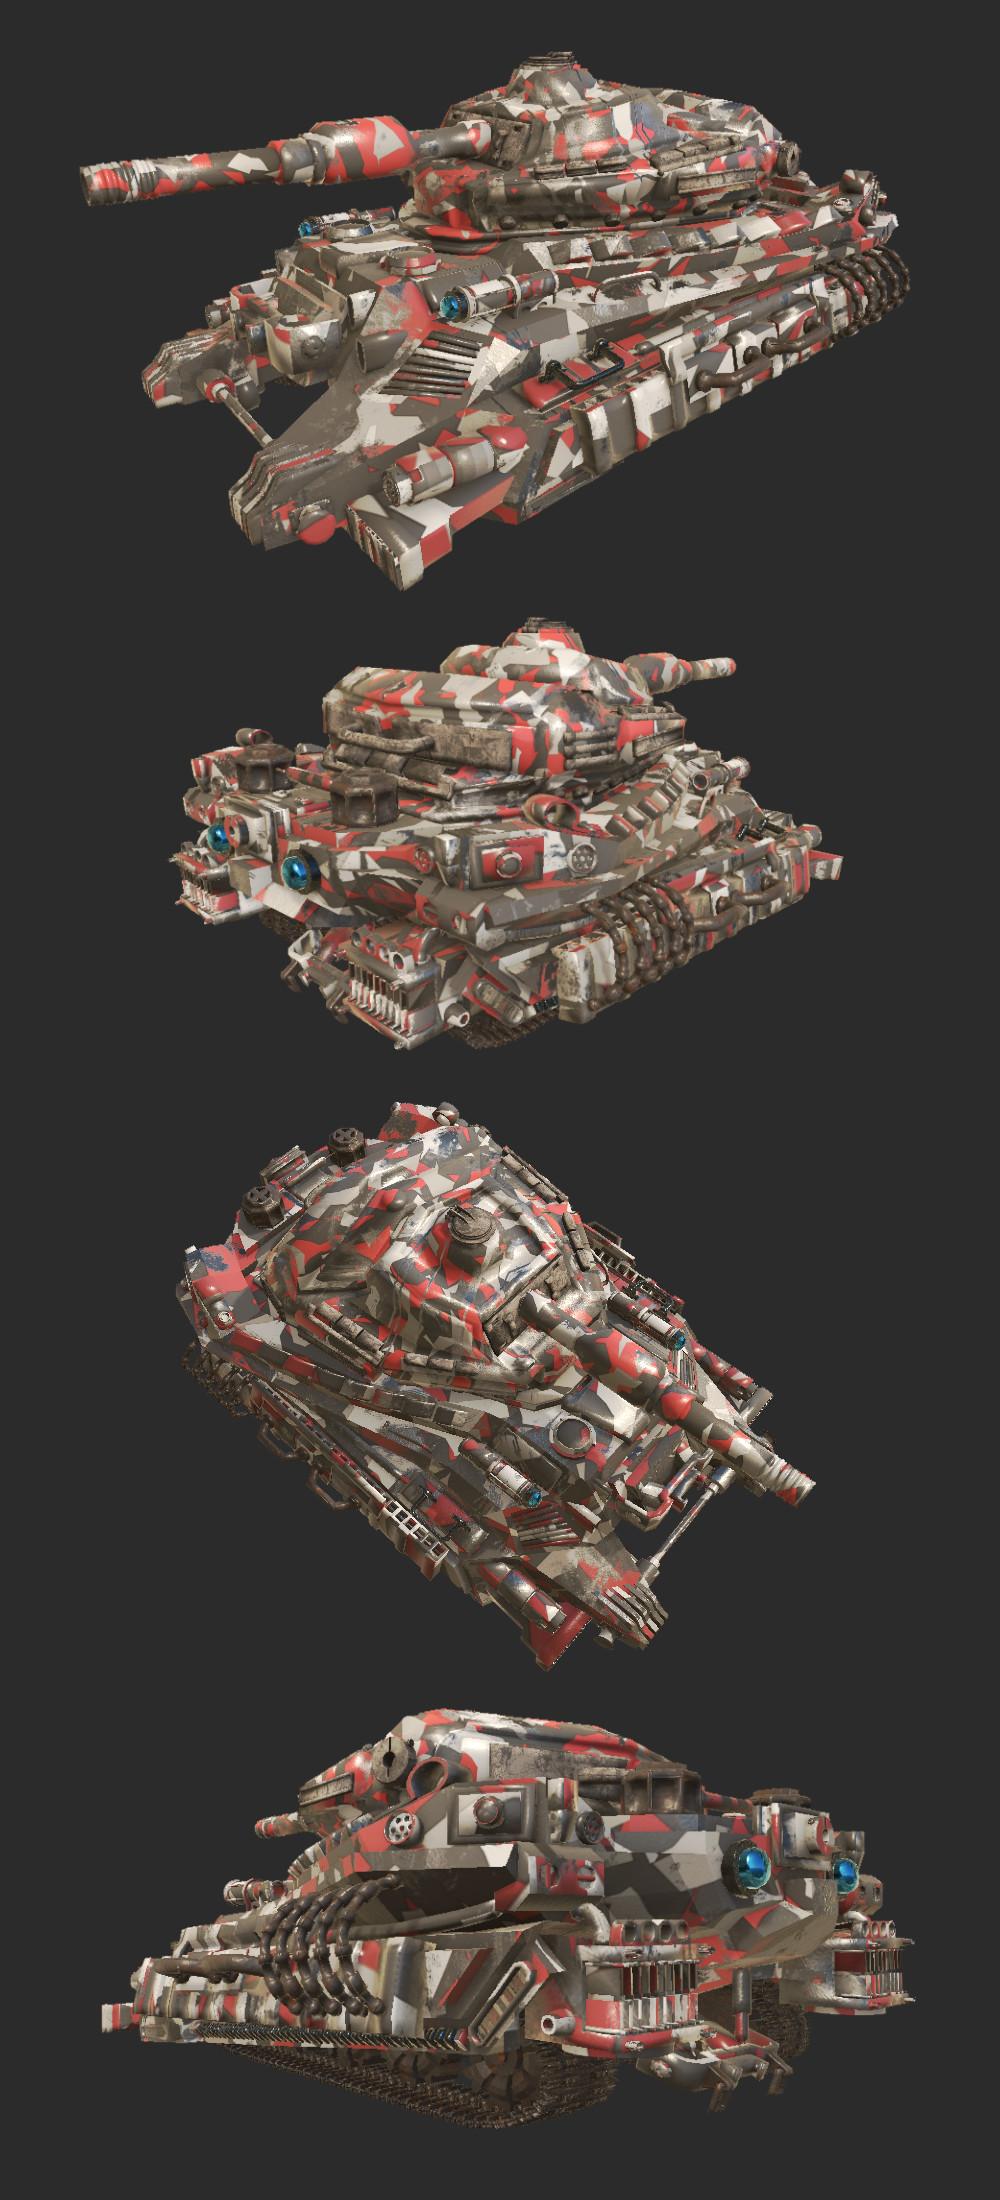 Omar pico 04 tank textures omarpico